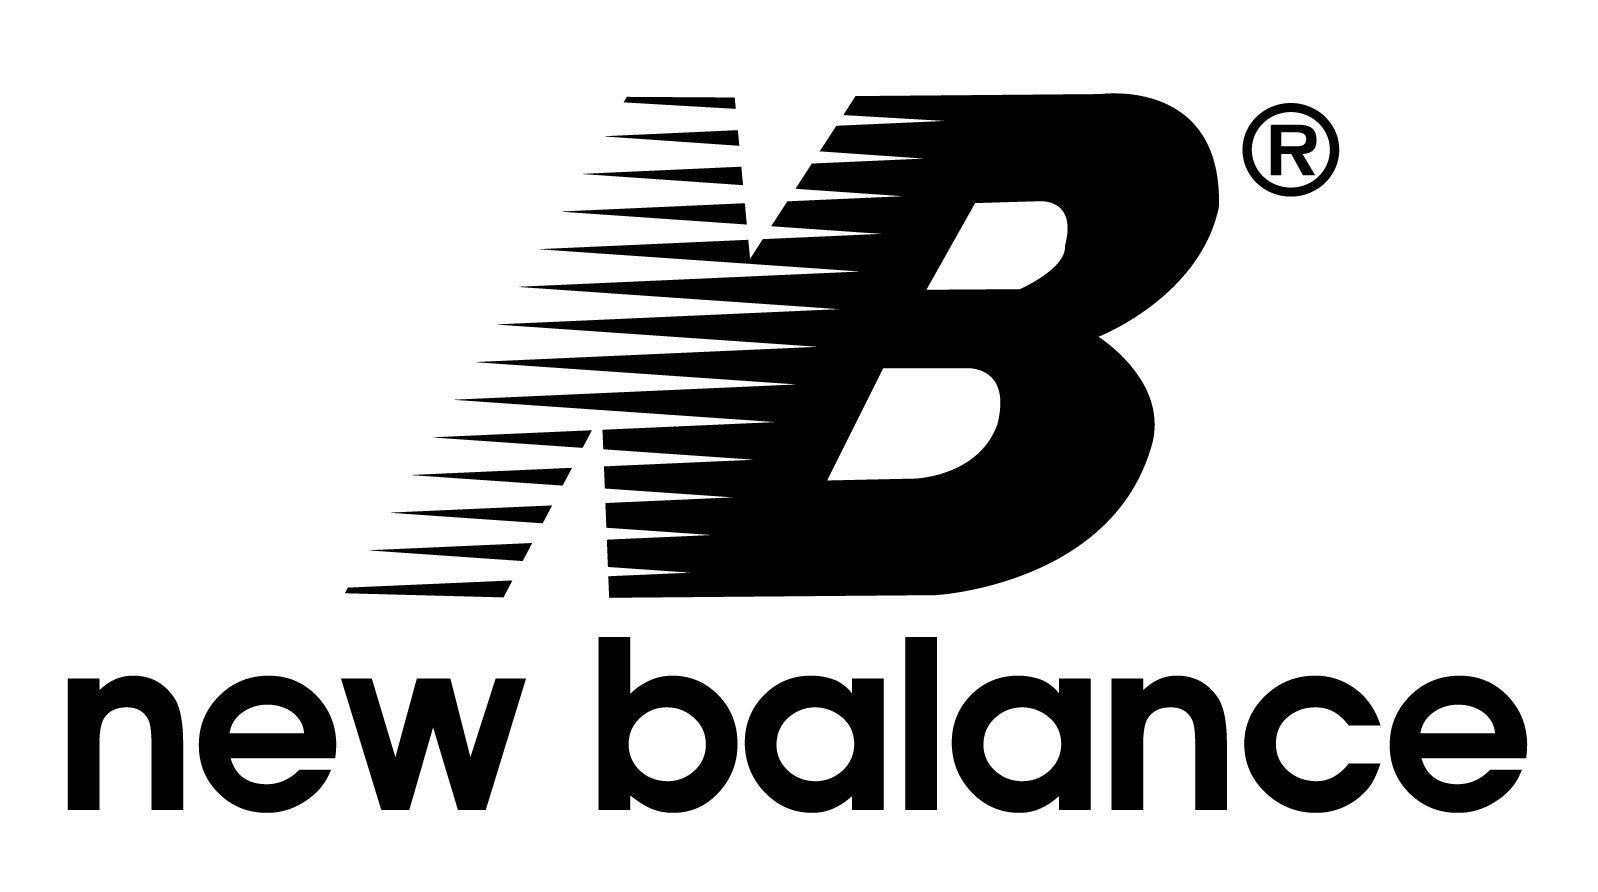 new balance name origin